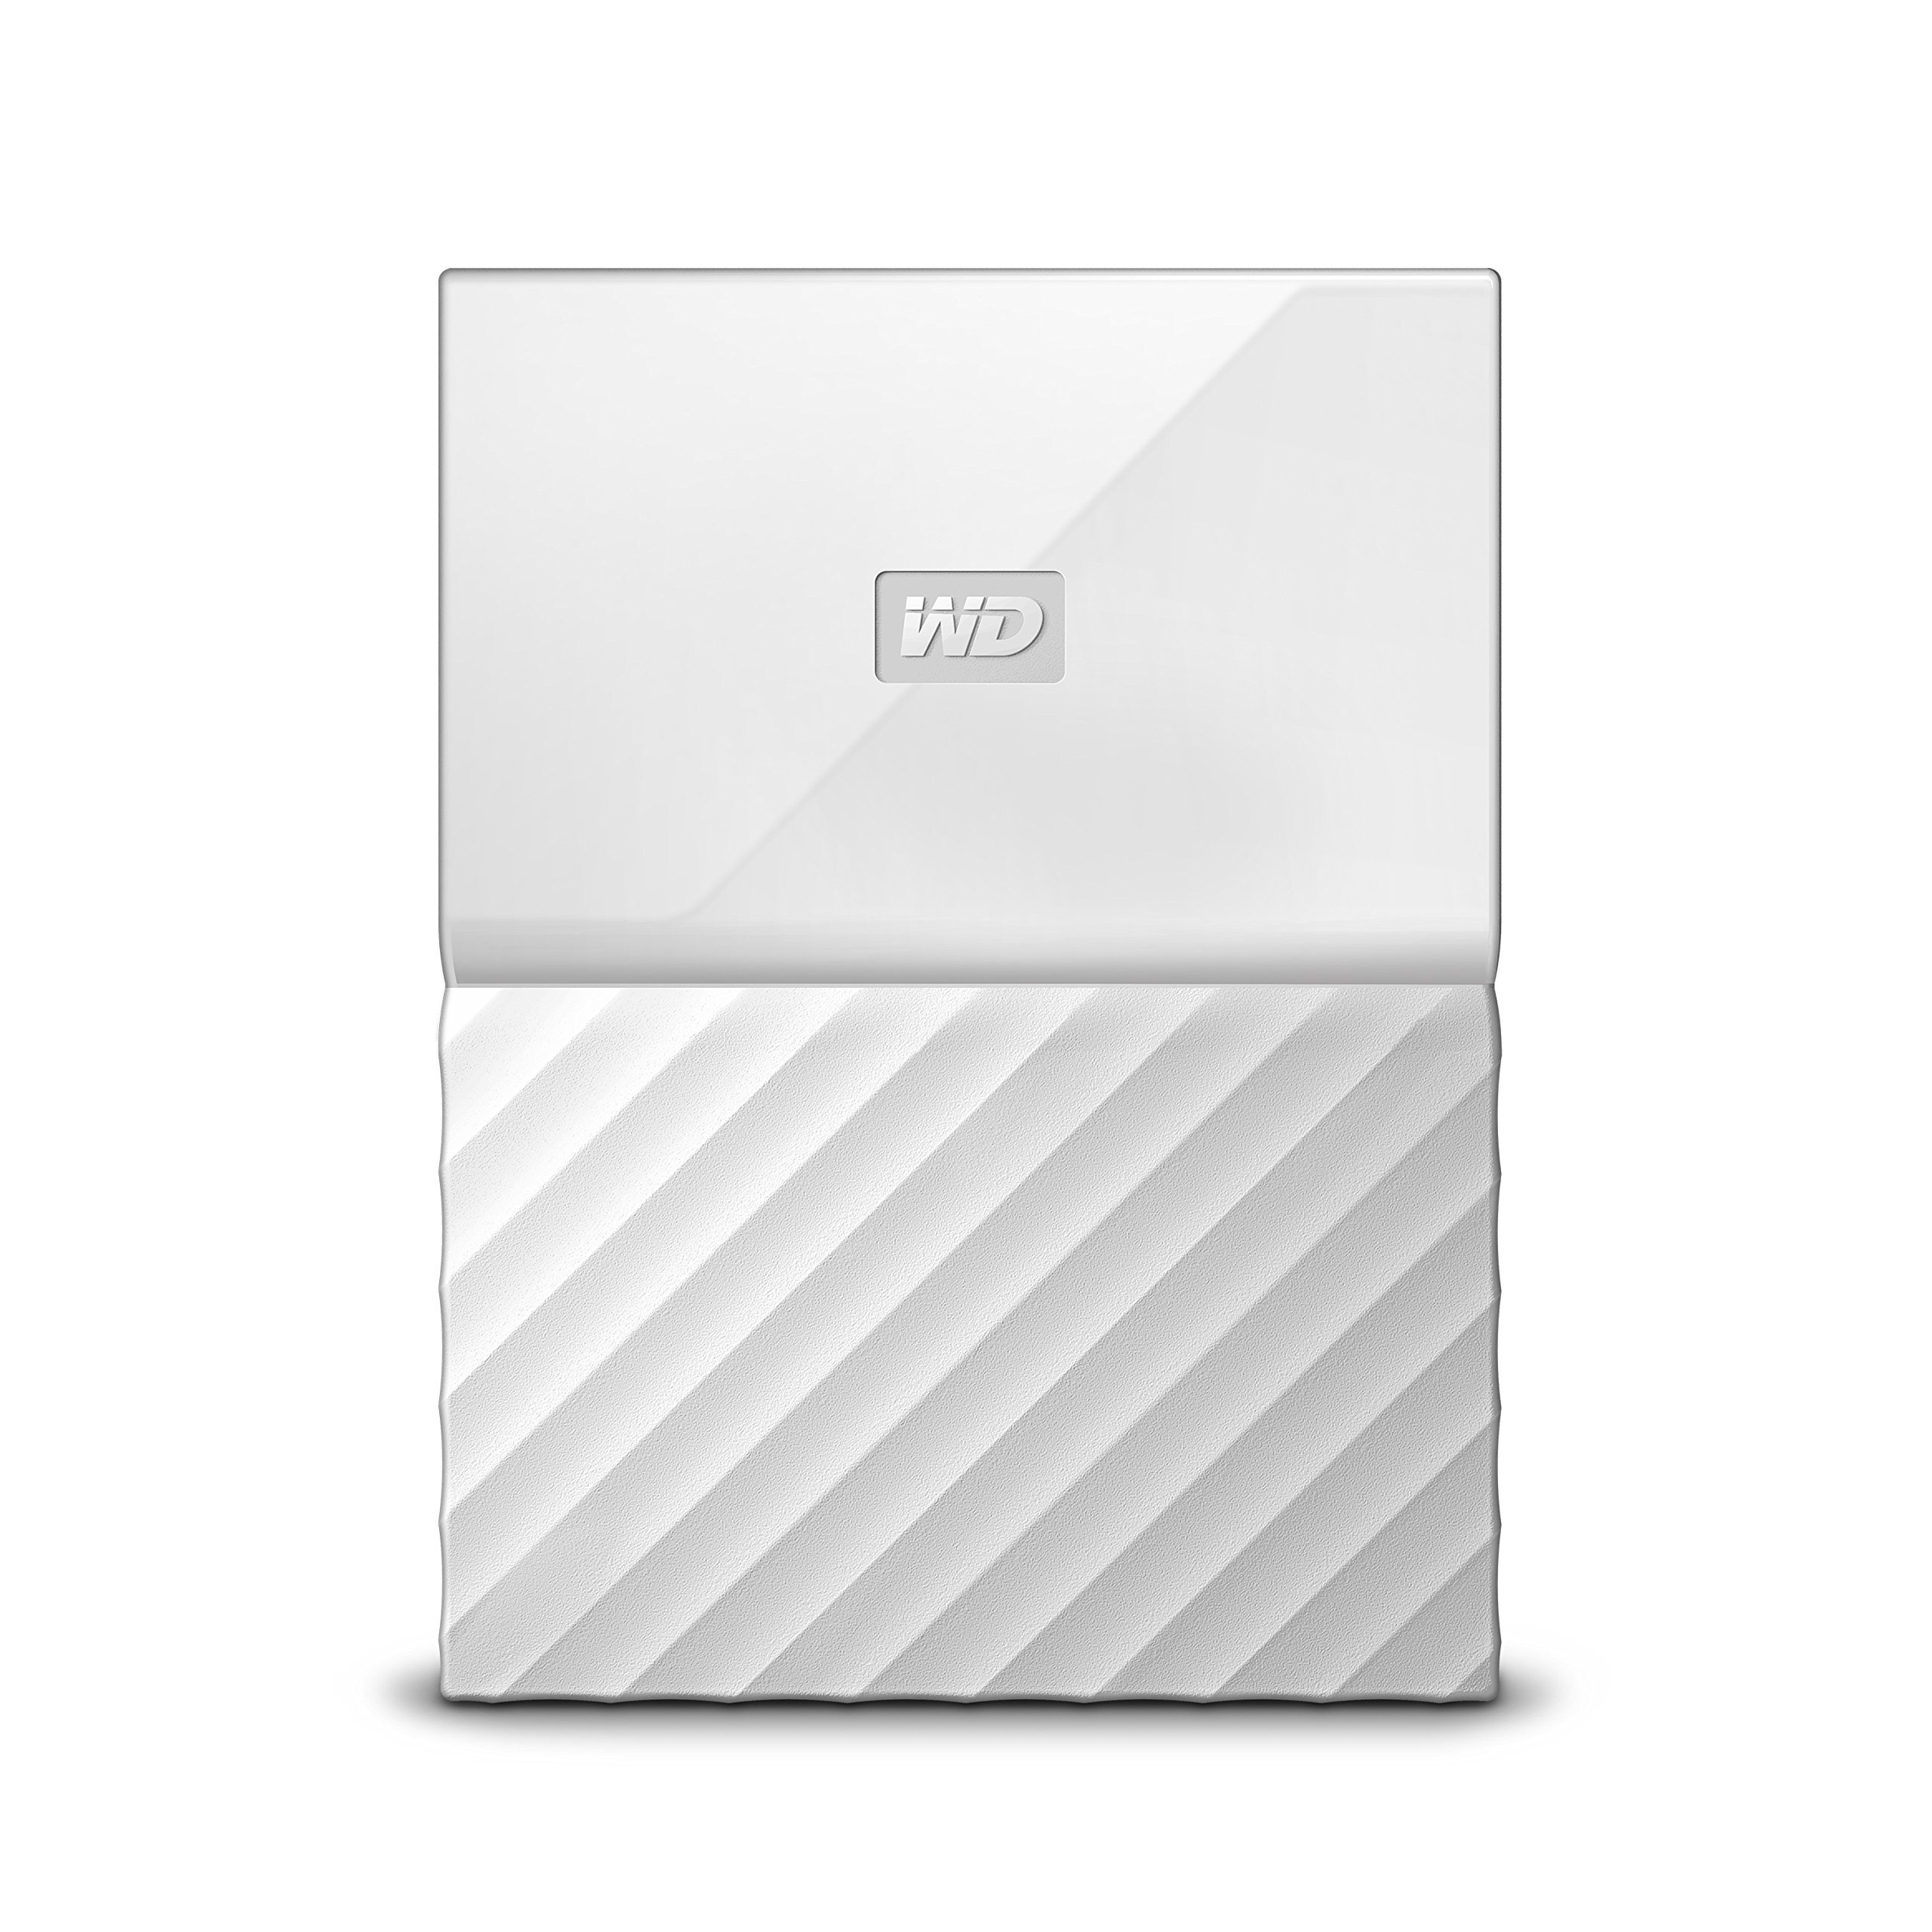 WD 1TB White My Passport Portable External Hard Drive - USB 3.0 - WDBYNN0010BWT-WESN (Certified Refurbished)